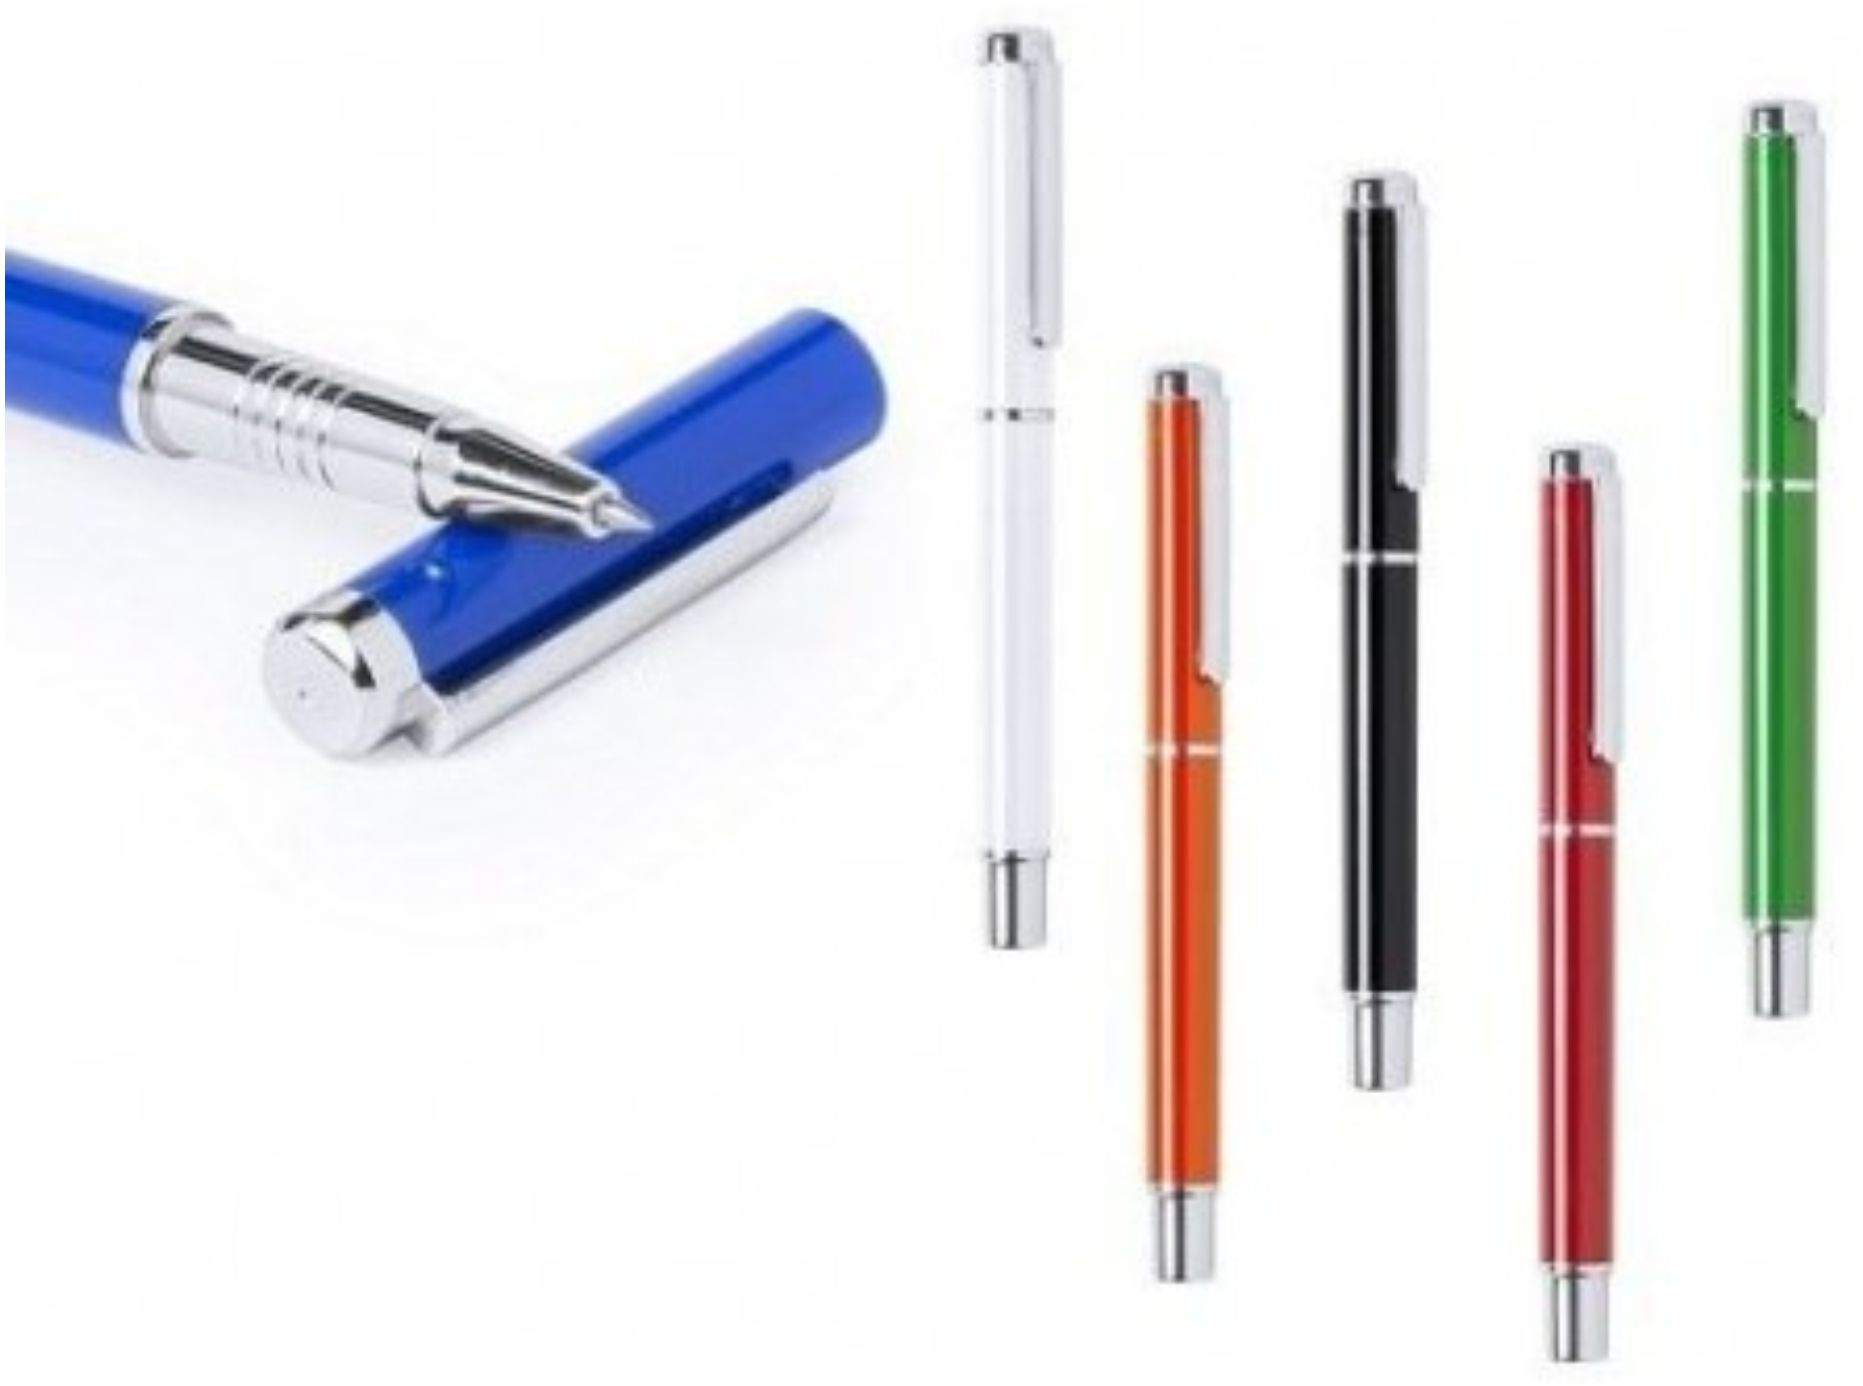 ручки роллер под нанесение